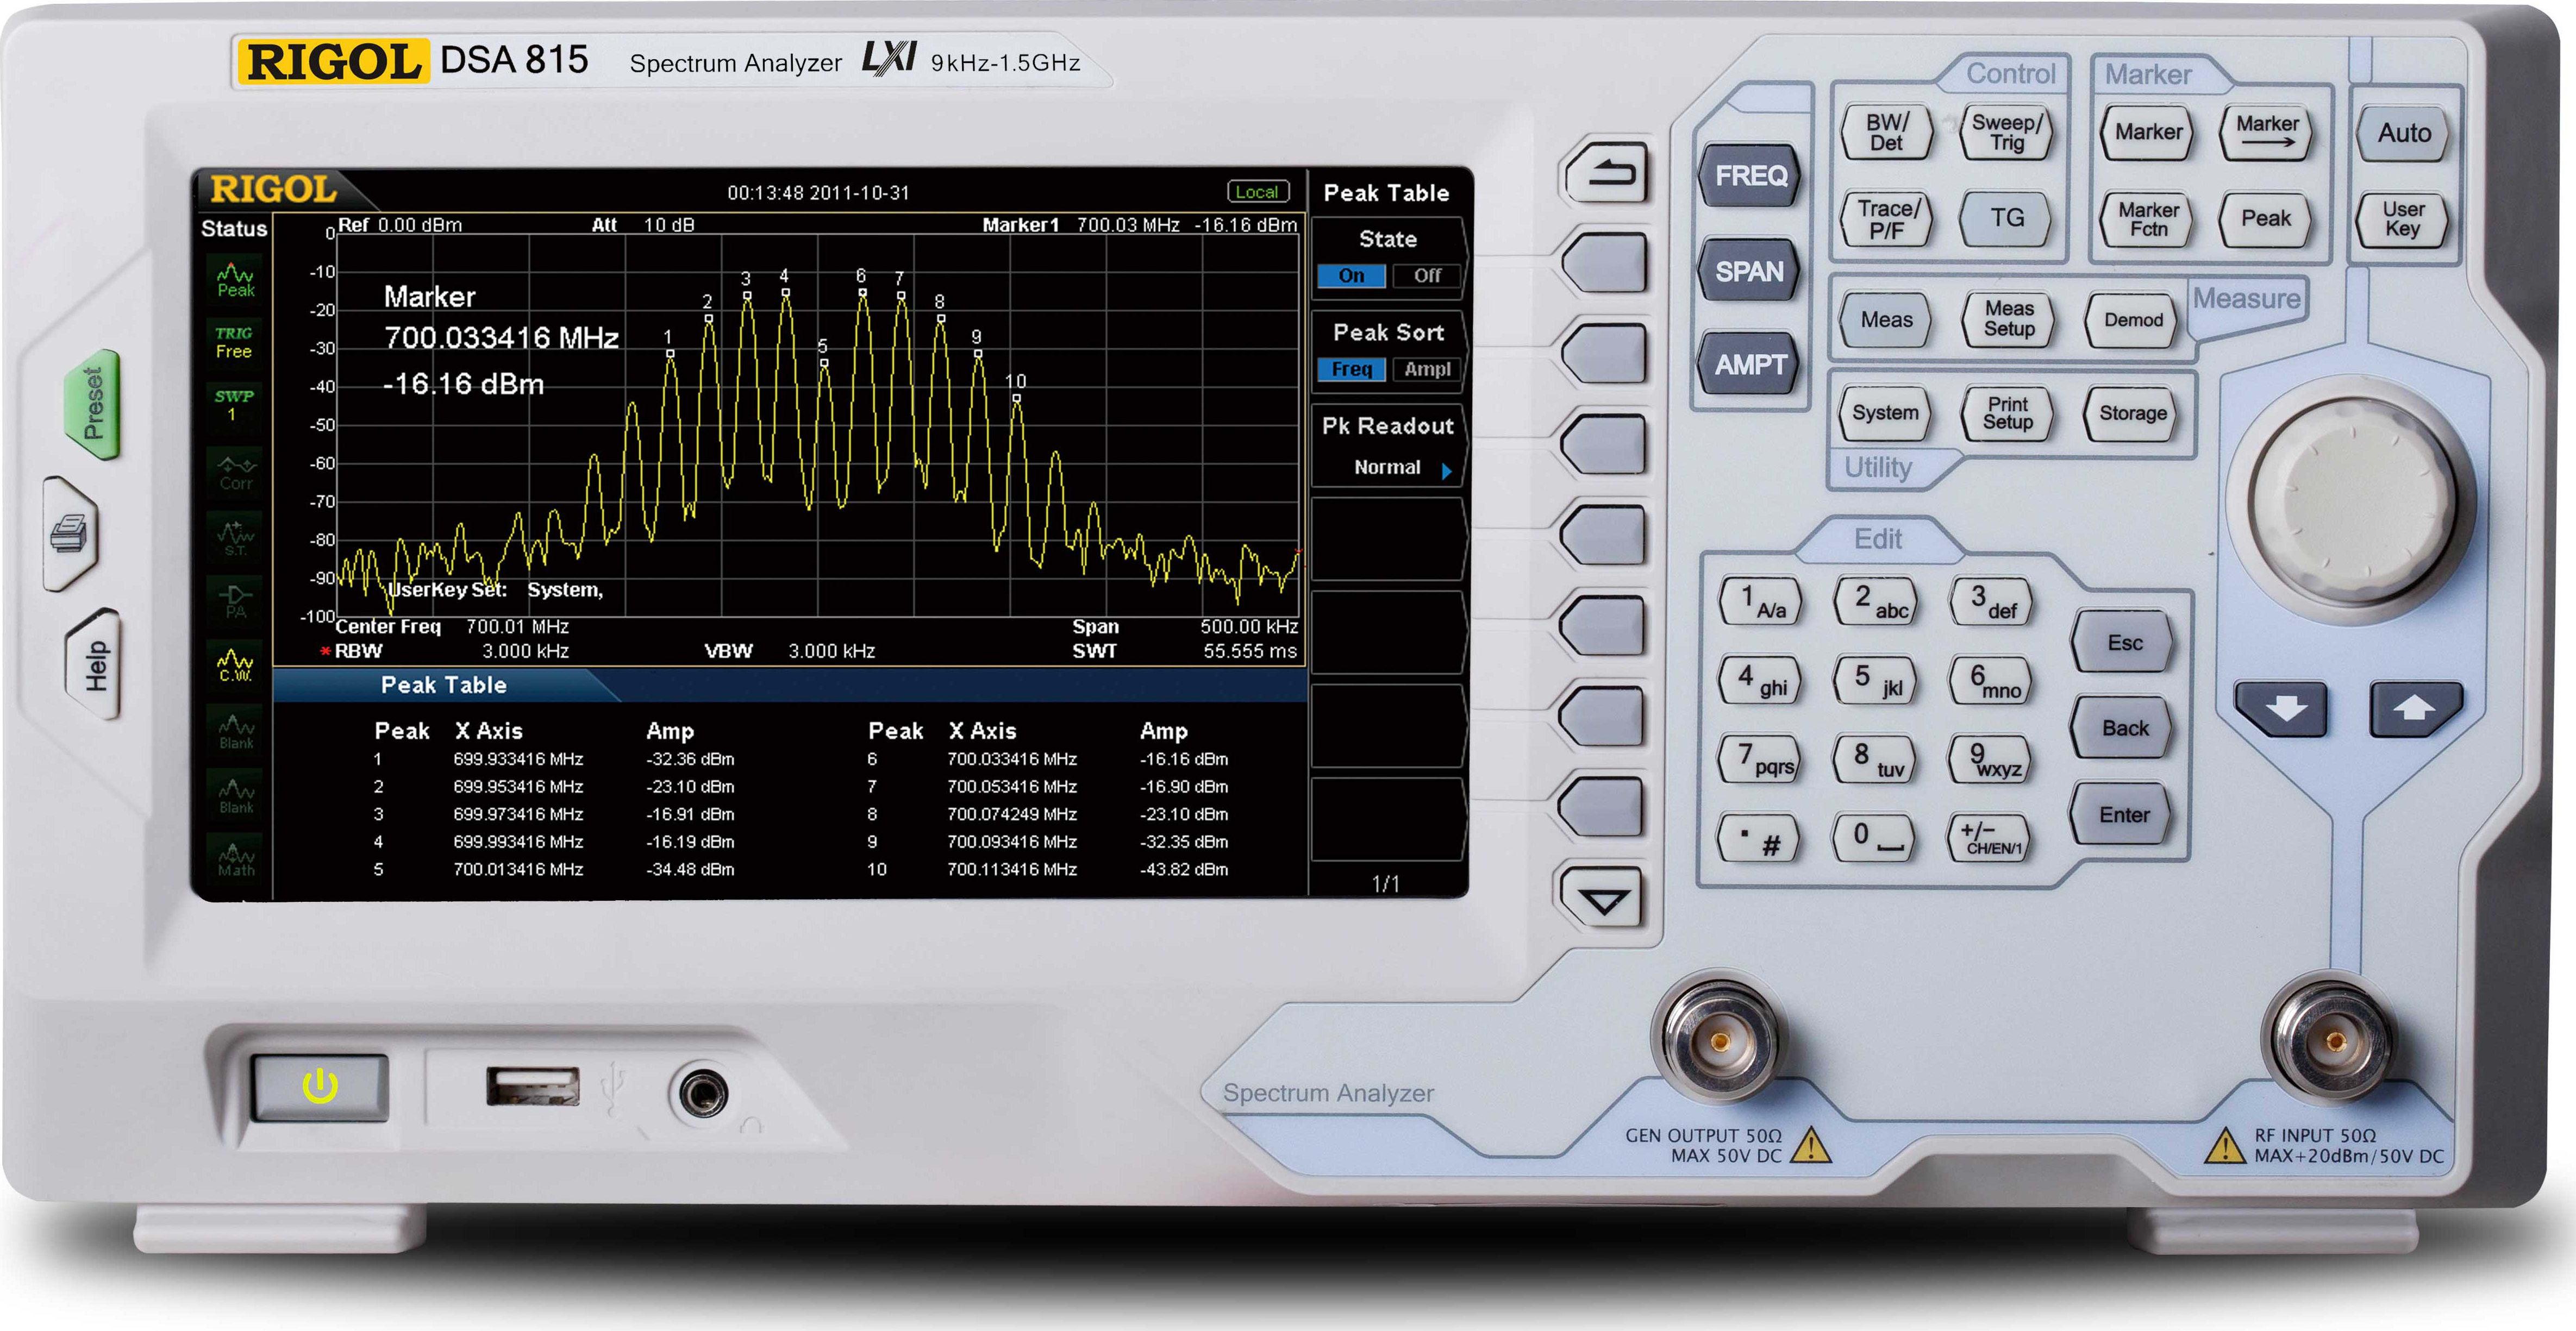 Rigol DSA815-TG-EMI+Probes Spectrum Analyzers - Bandwidth